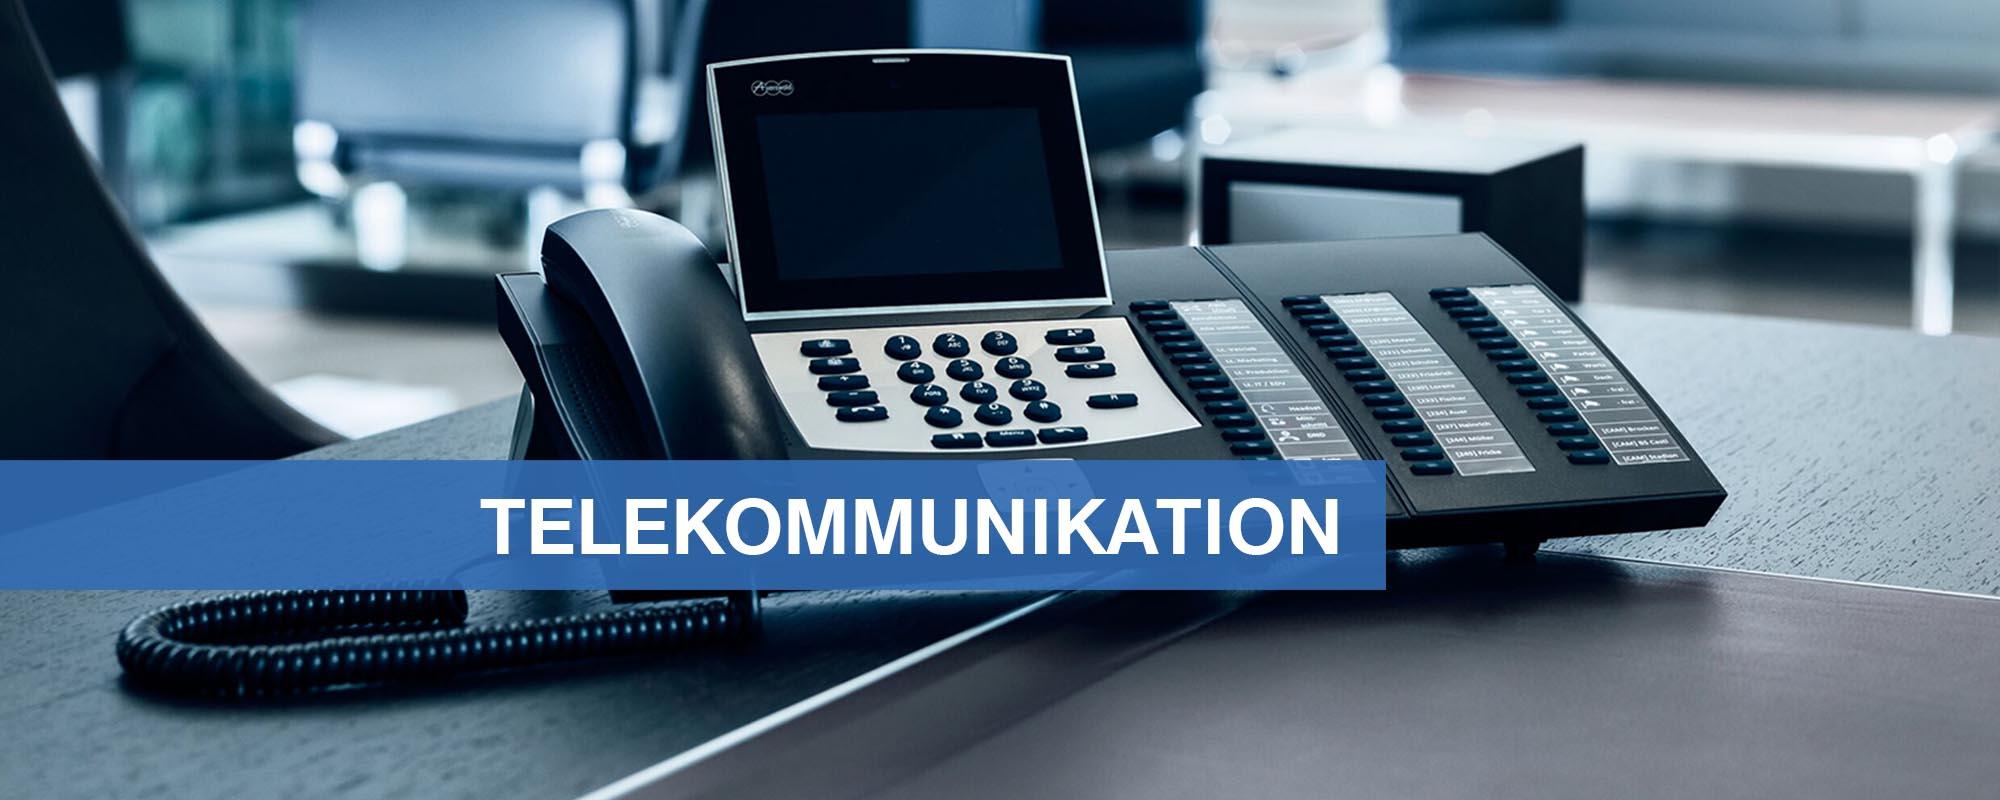 bagala-it-systemhaus-krefeld-duesseldorf-digital-signage-it-sicherheit-hardware-software-netzwerk-webdesign-telekommunikation